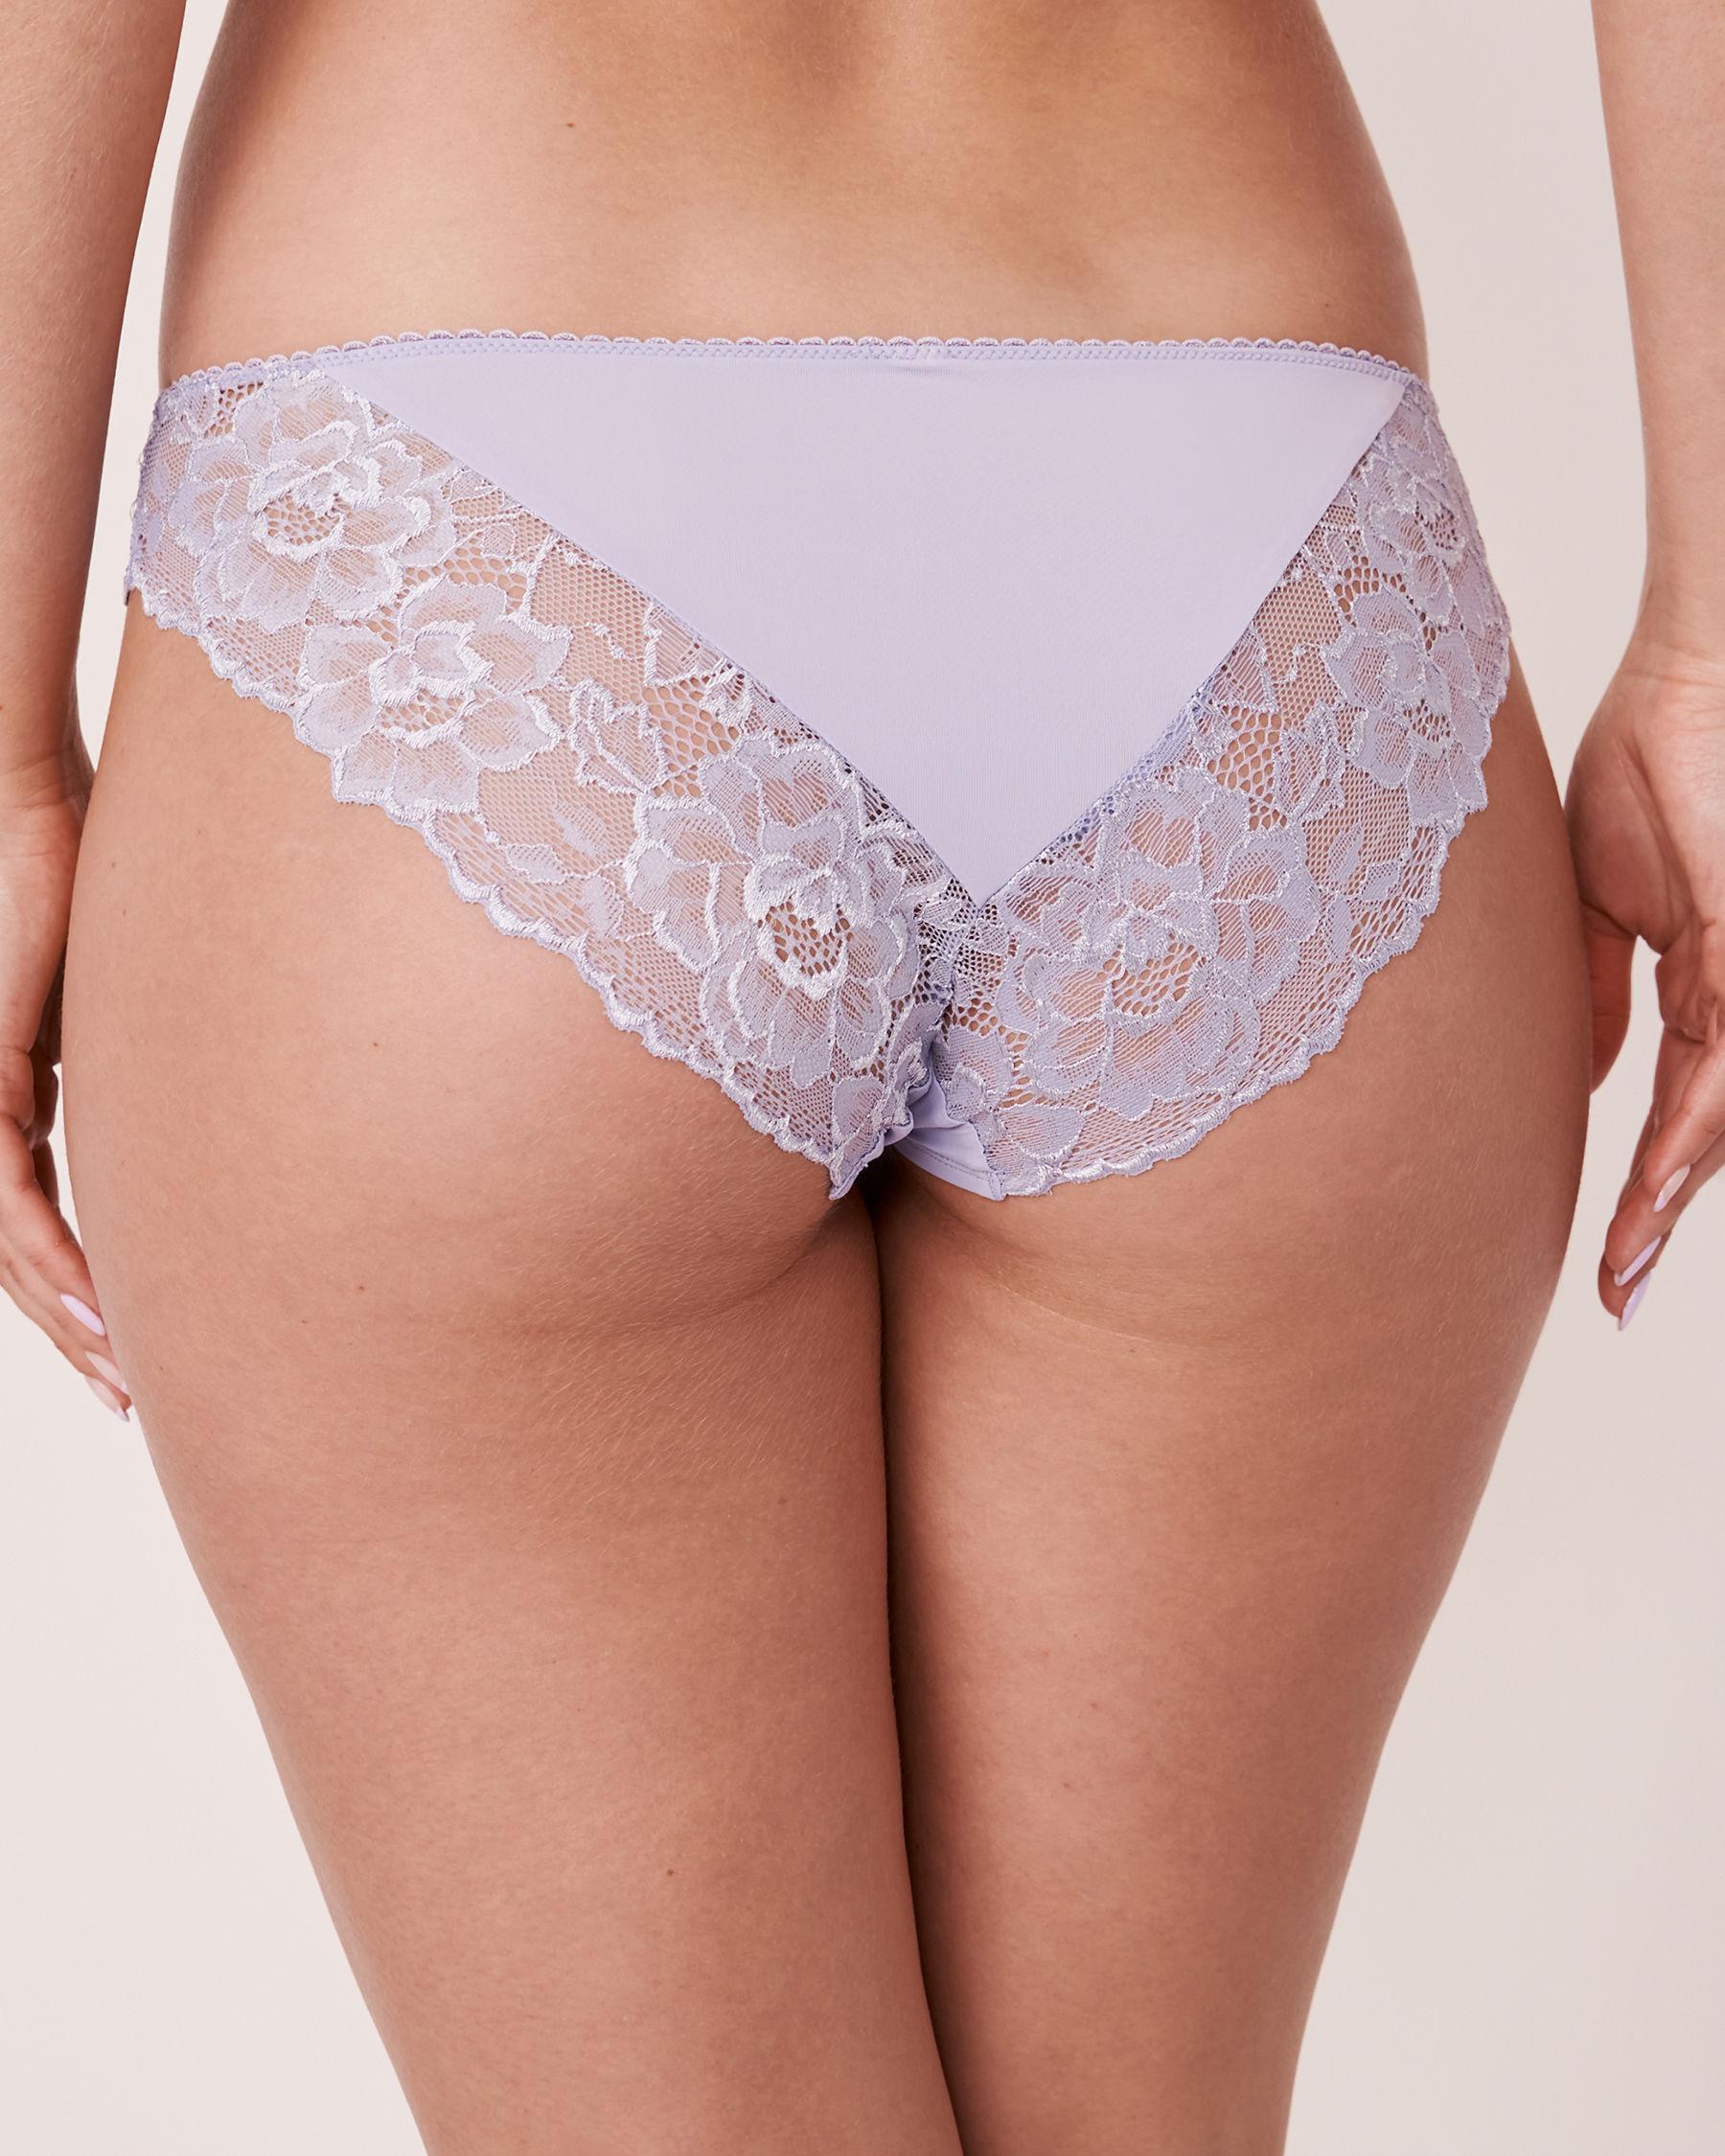 LA VIE EN ROSE Bikini Panty Ombres roses 20200067 - View2